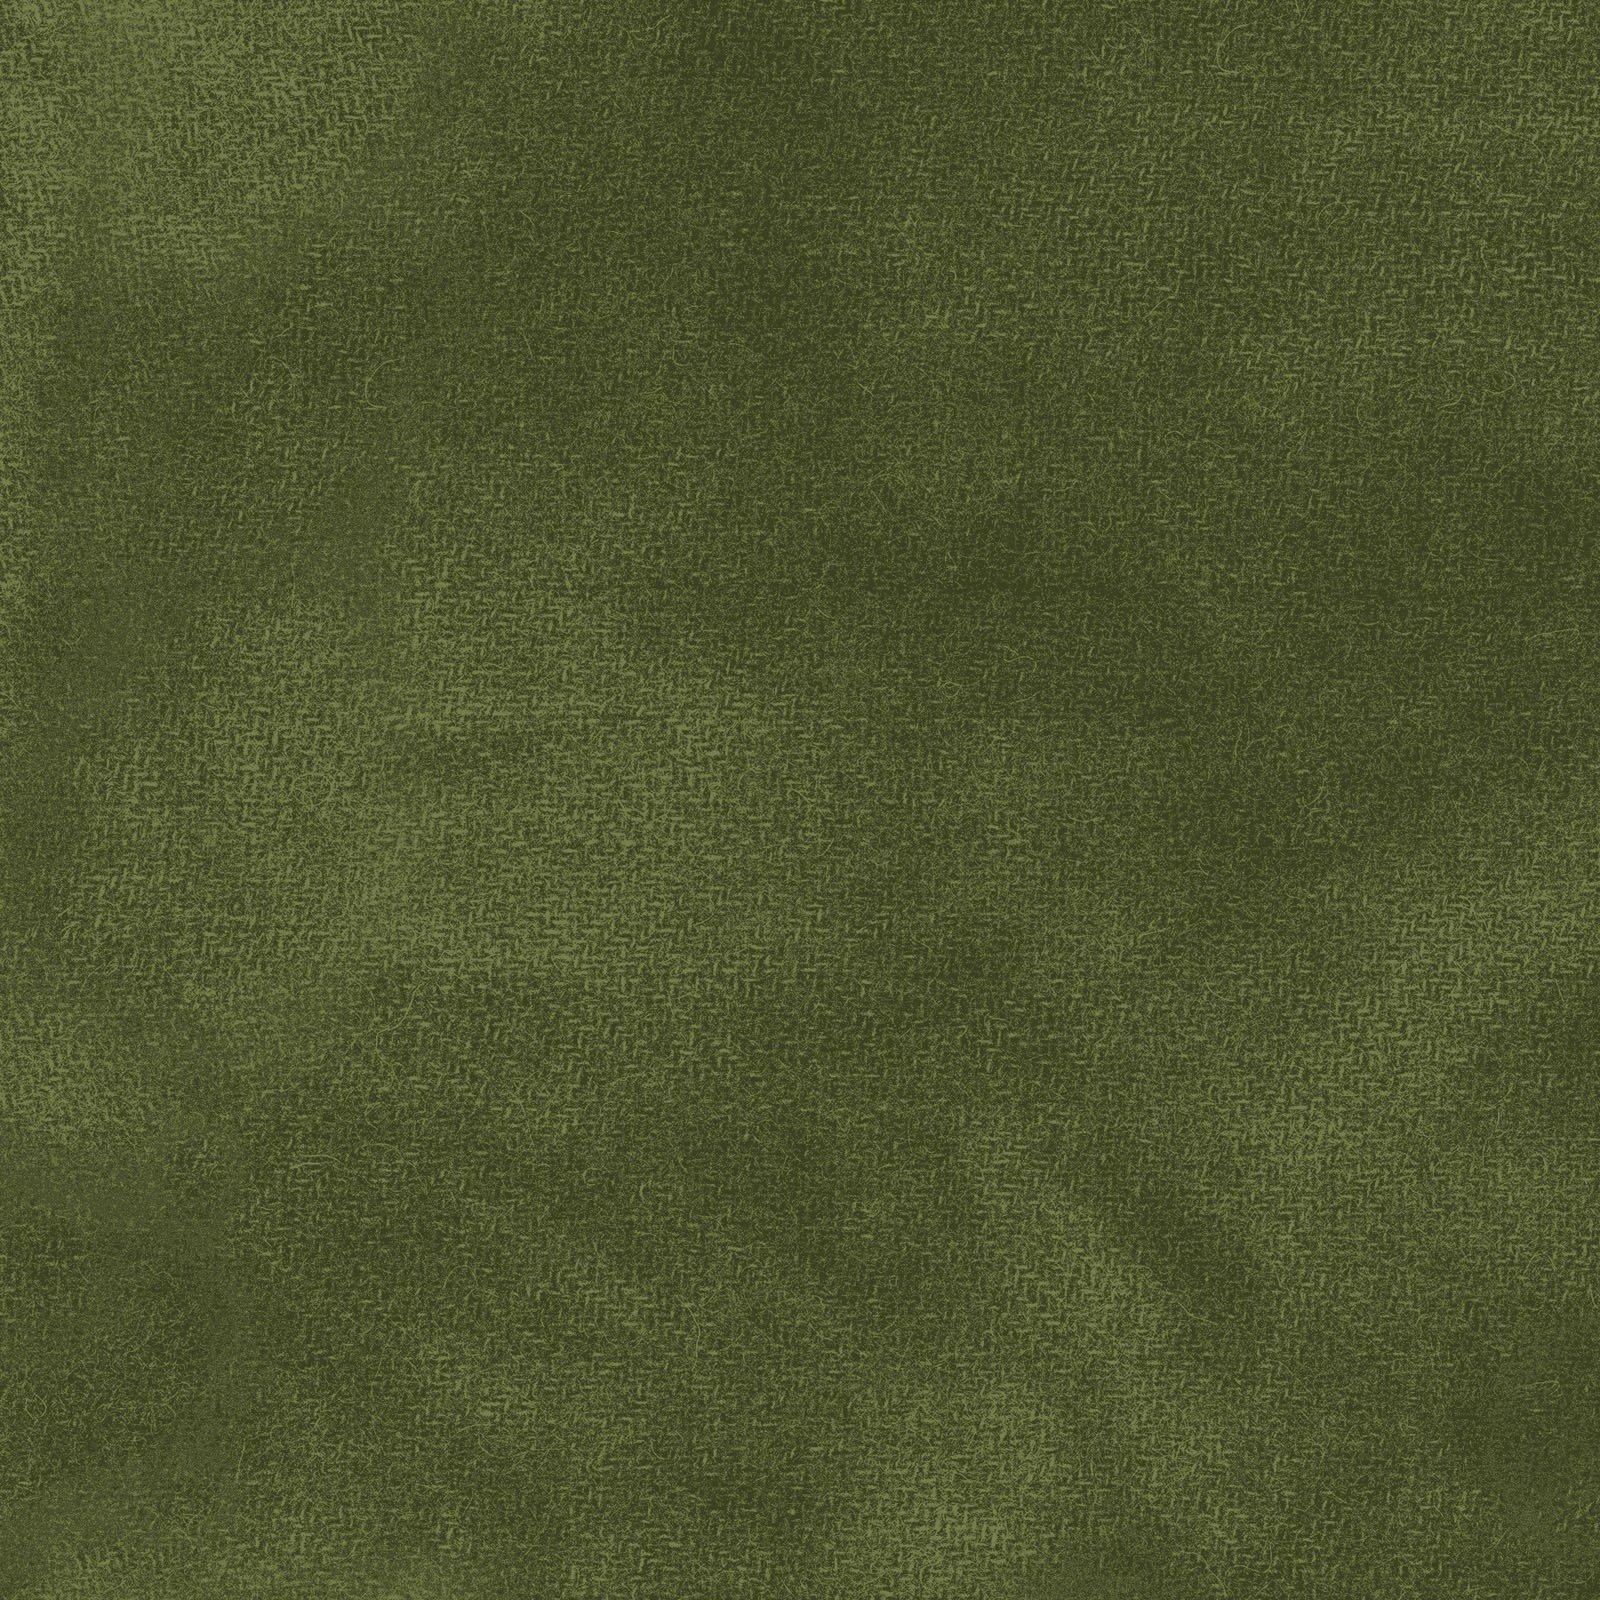 Color Wash Woolies Flannel - Cyprus Garden